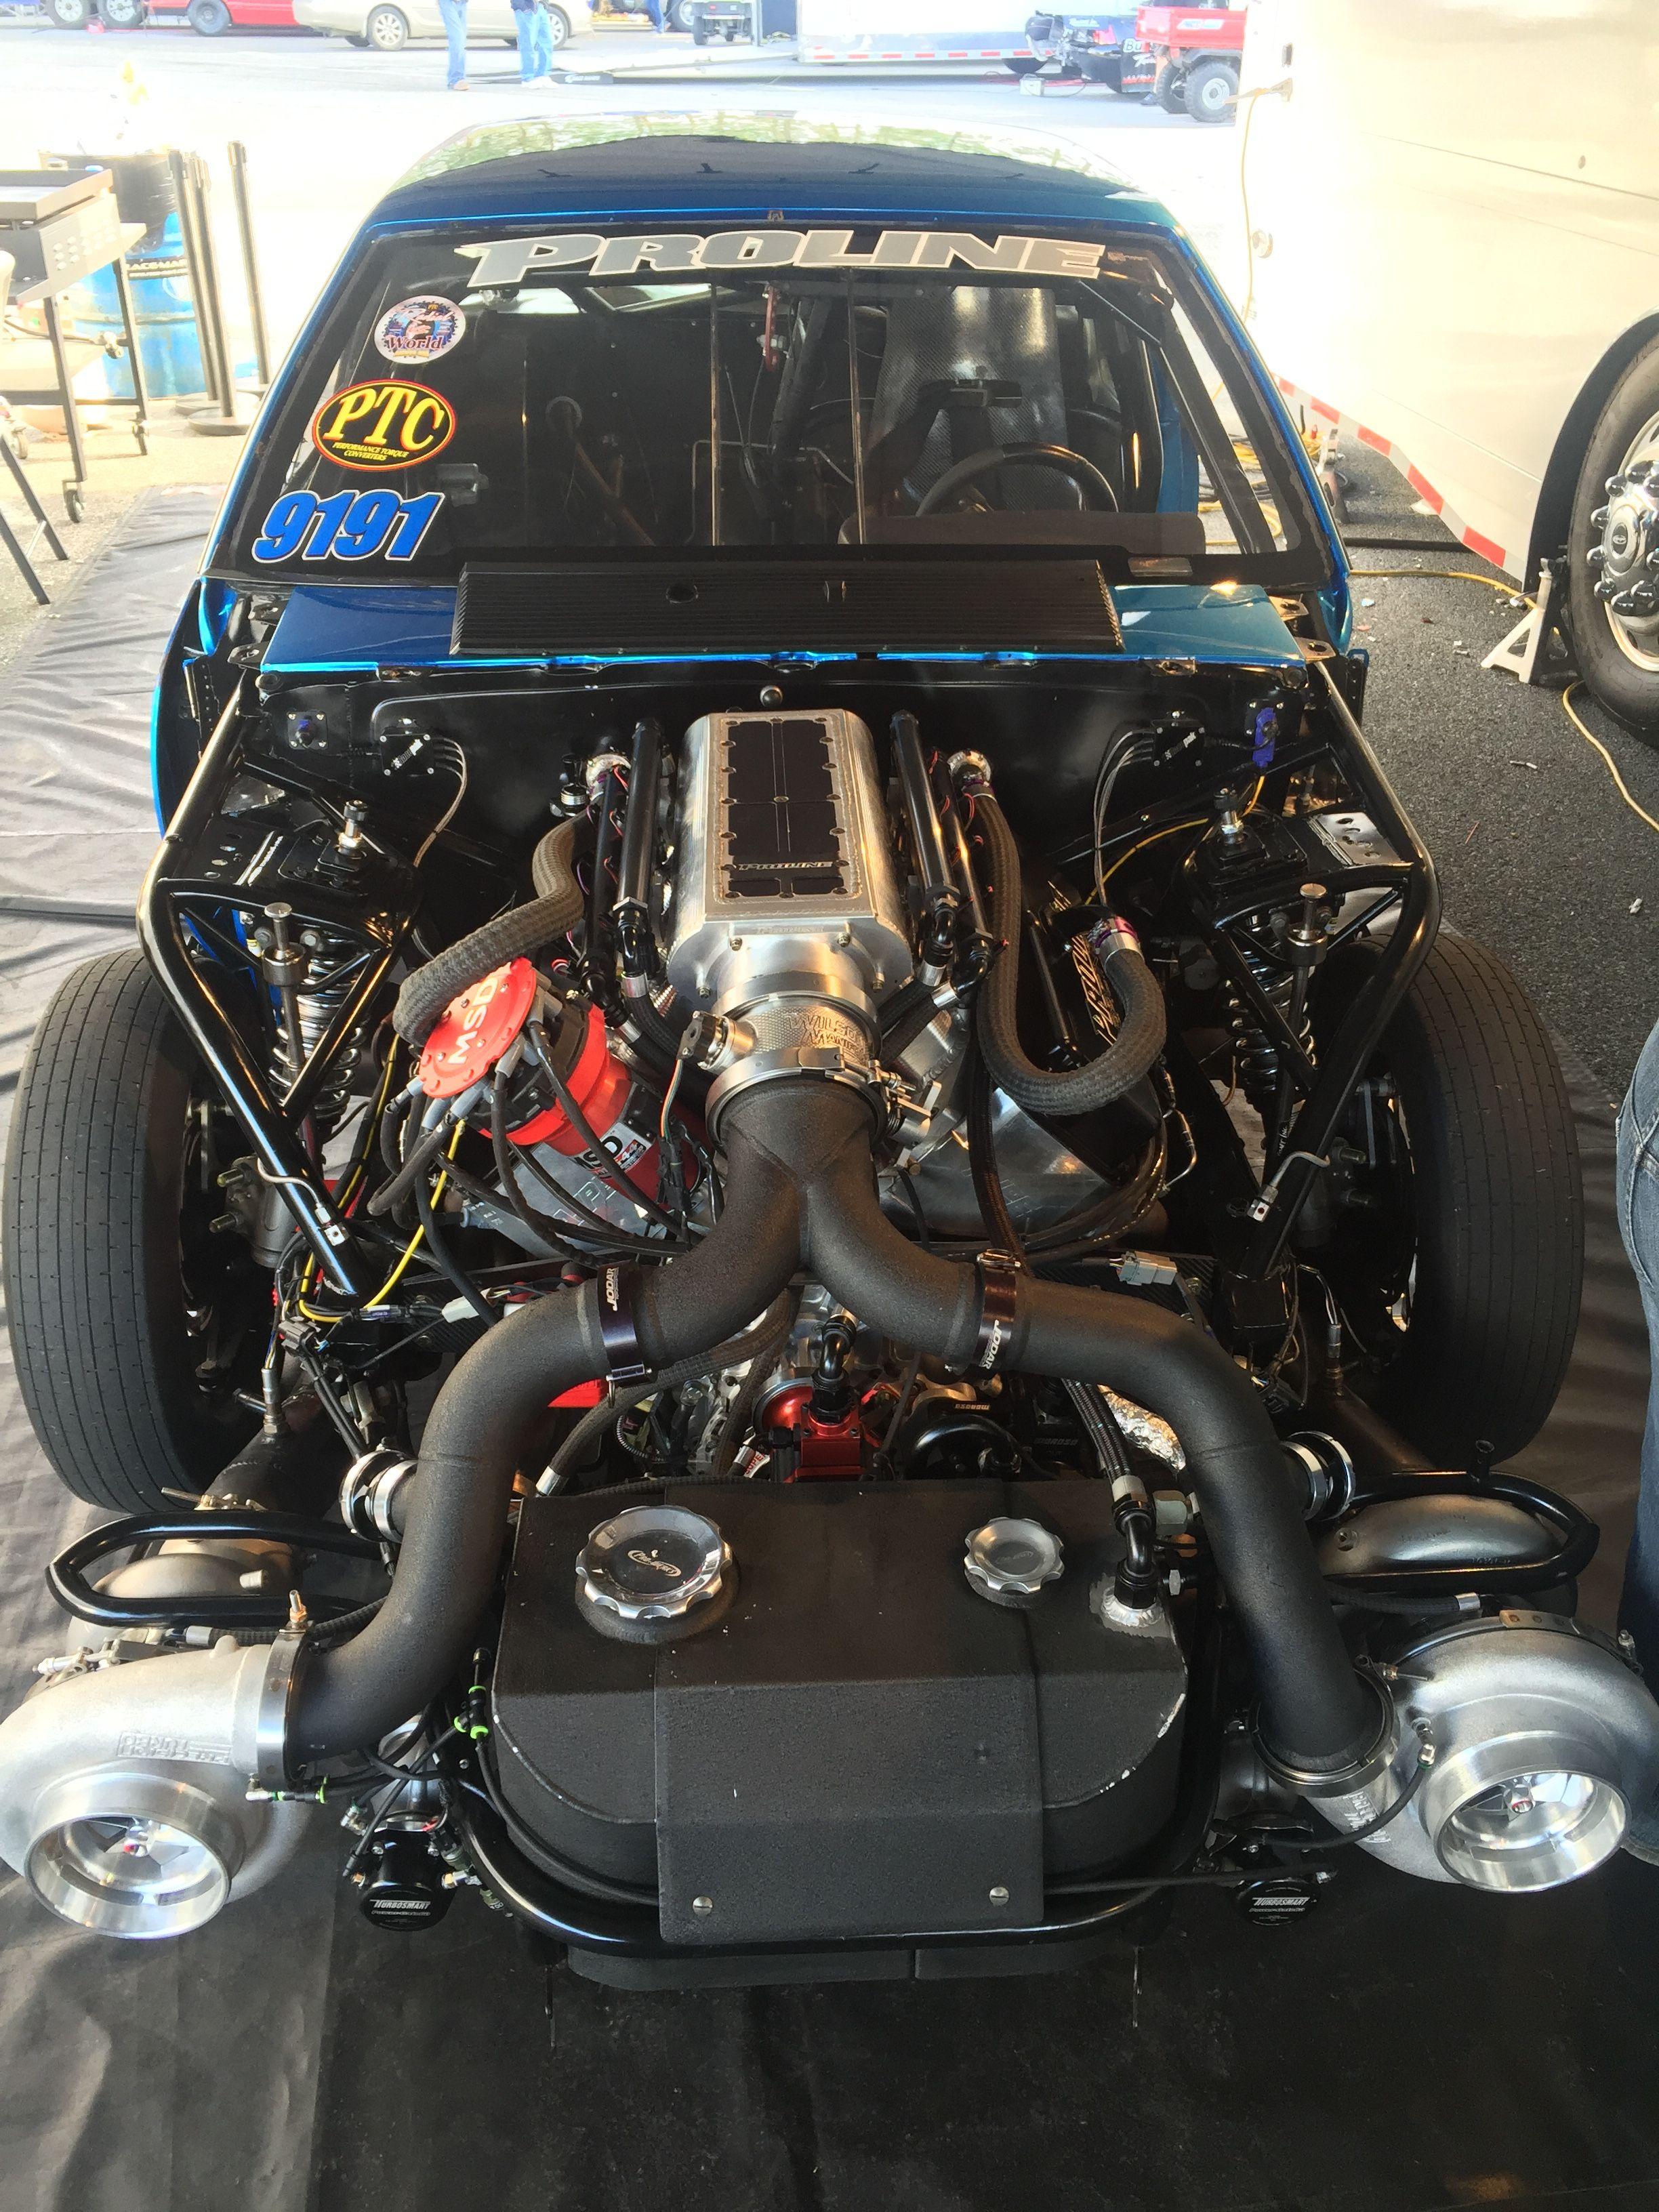 small resolution of fletcher cox 481x 572 motor turbo car twin turbo trucks and girls